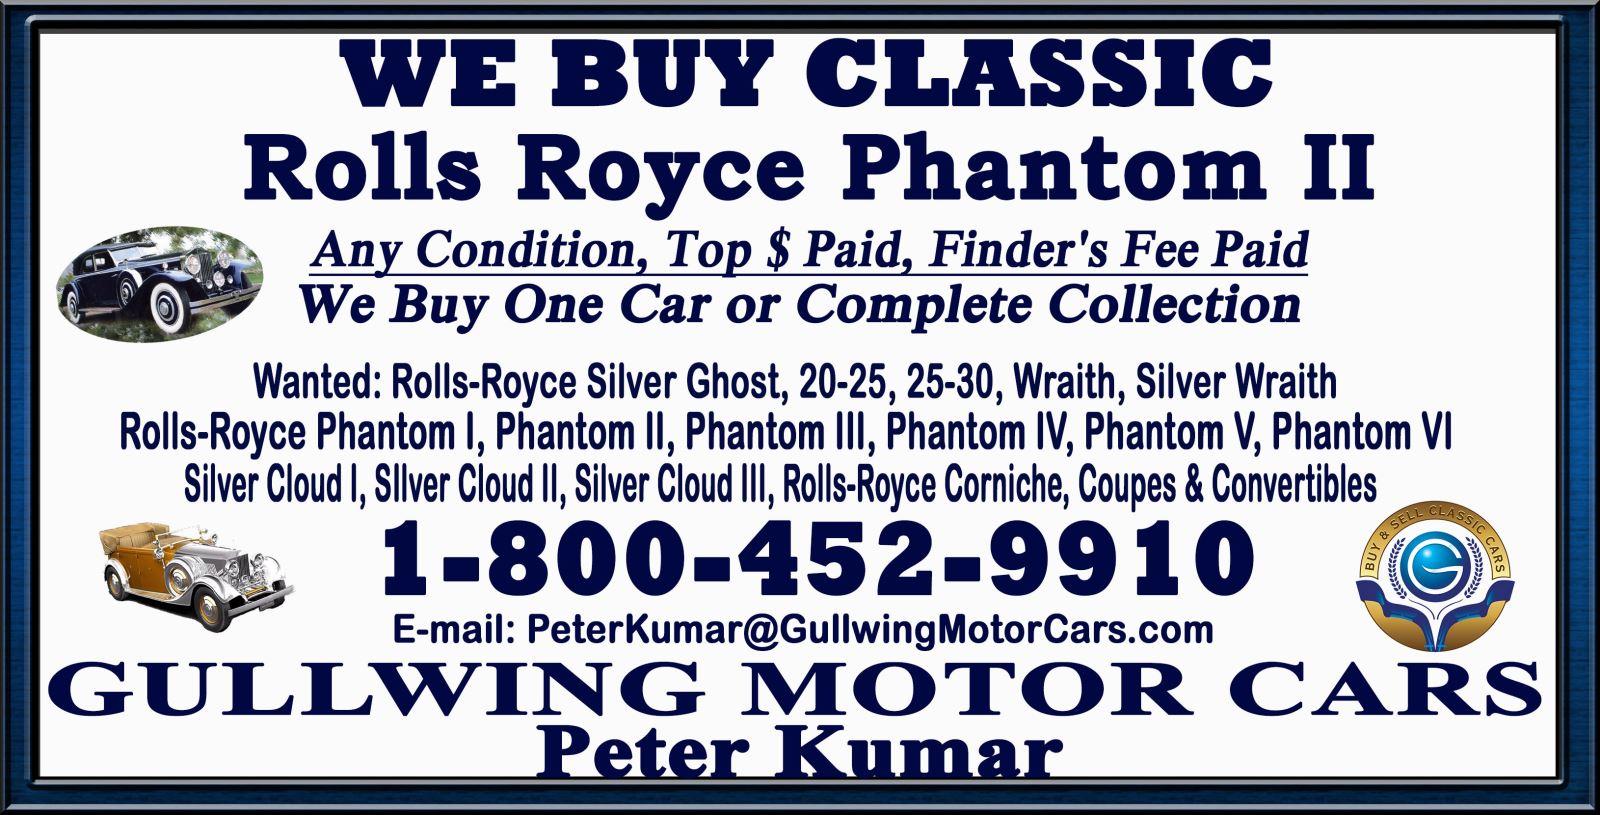 Sell Classic Rolls Royce Phantom II | Call Gullwing Motor if Vintage Rolls Royce Phantom II For Sale